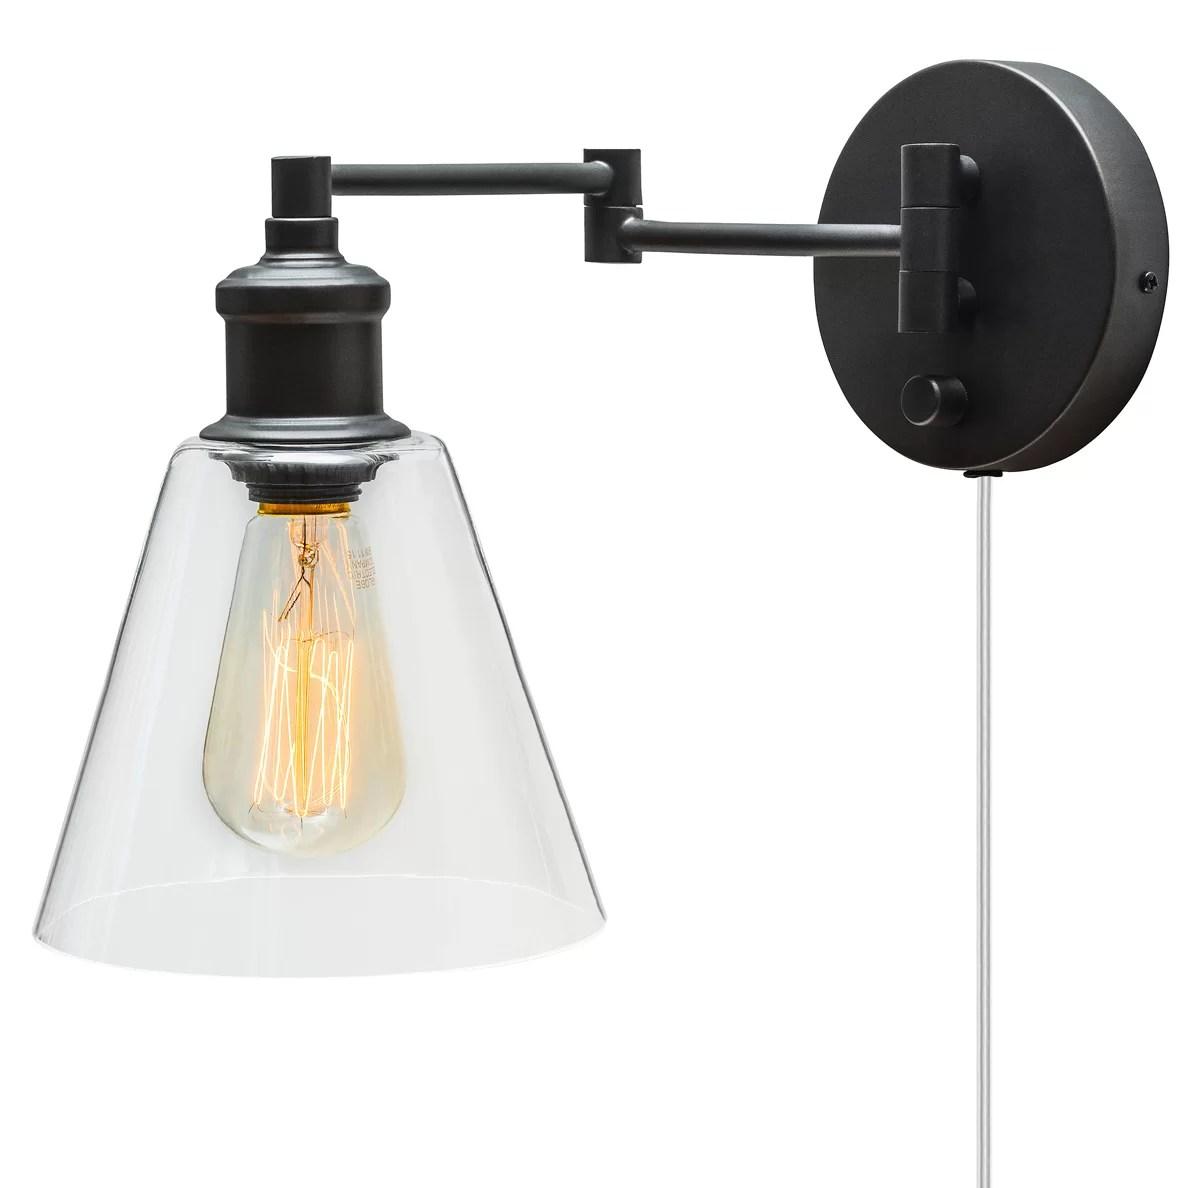 Globe Electric Company Adison 1 Light Plug In Industrial ... on Plugin Wall Sconce Lights id=82130